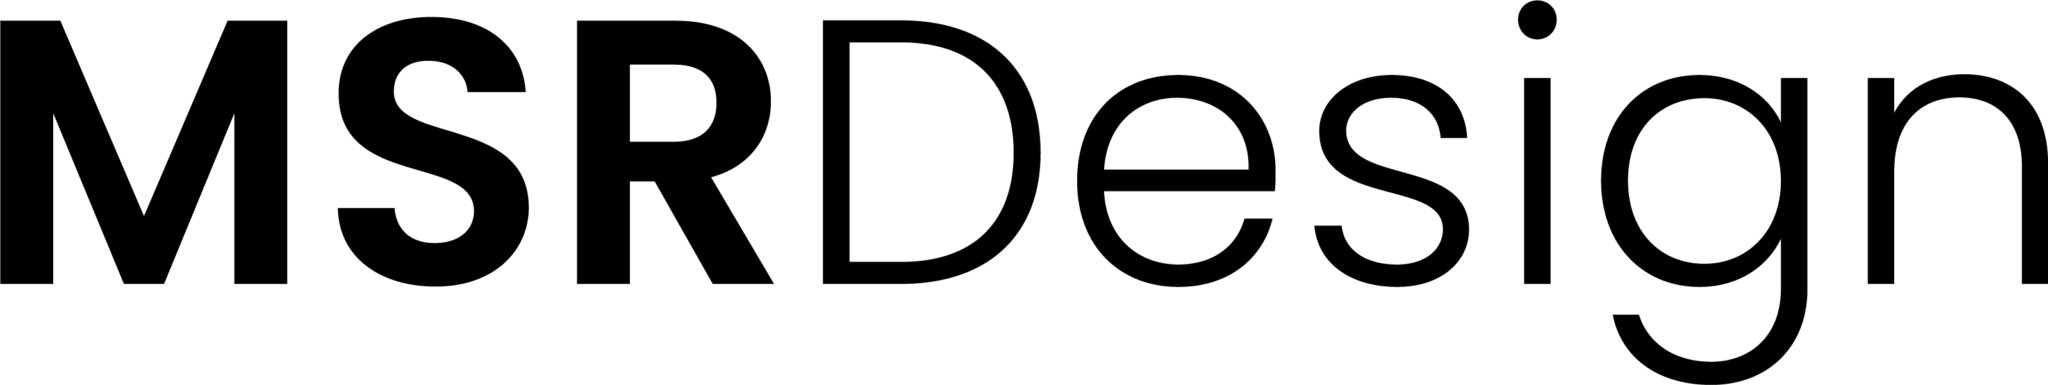 MSR Design_Black RGB